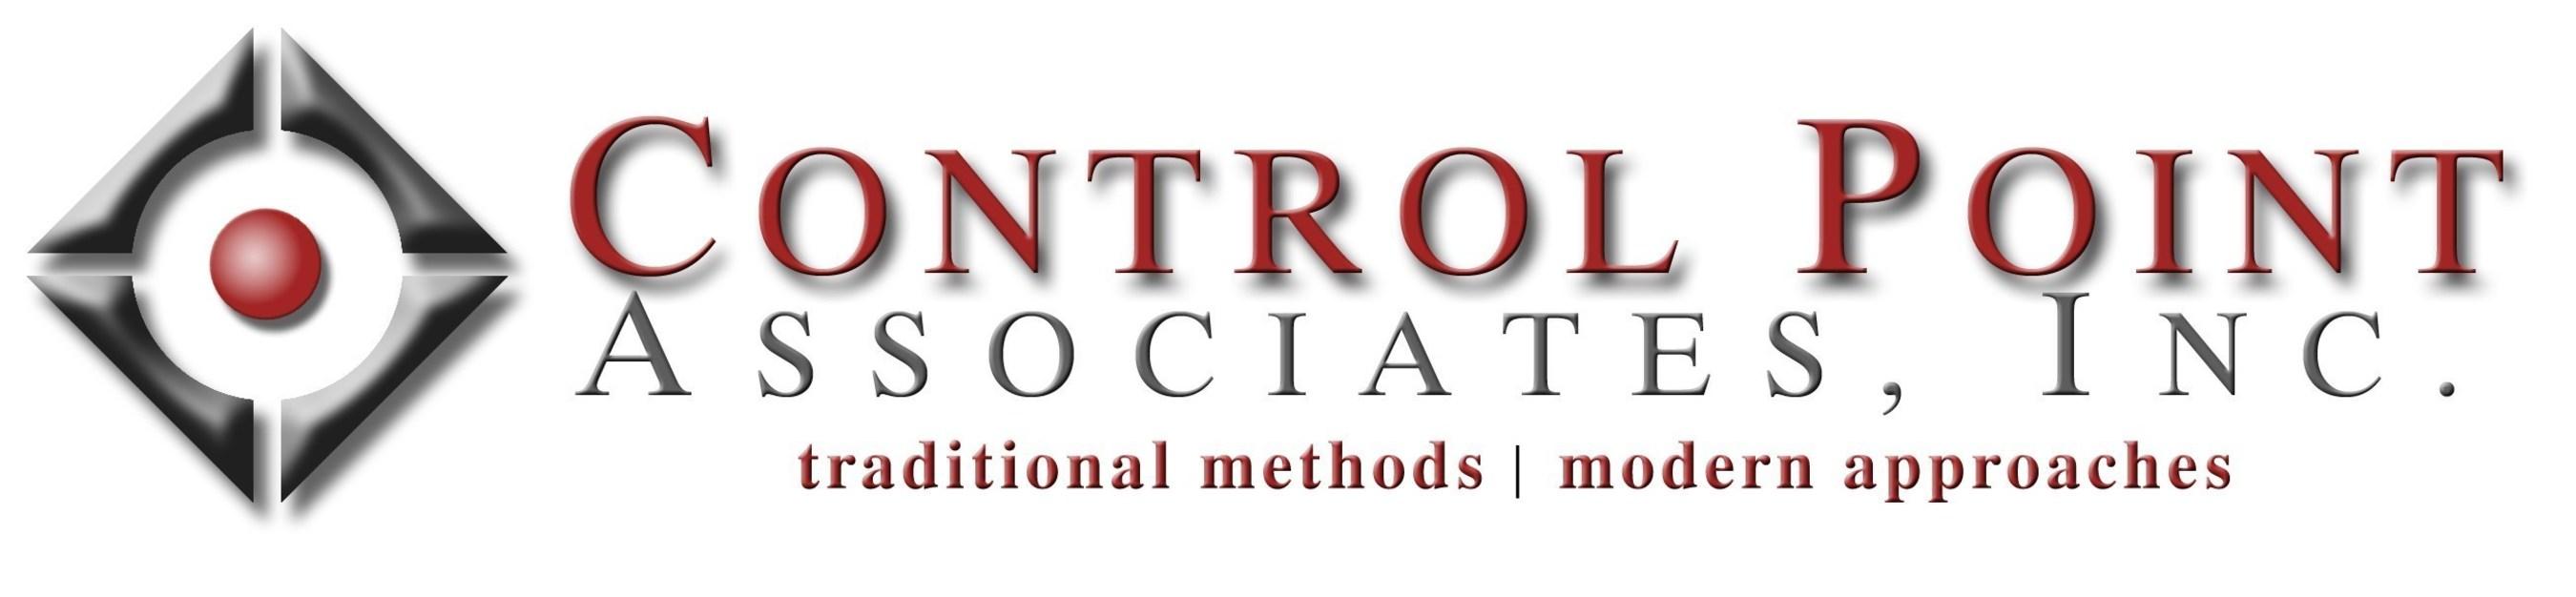 Control Point Associates, Inc.